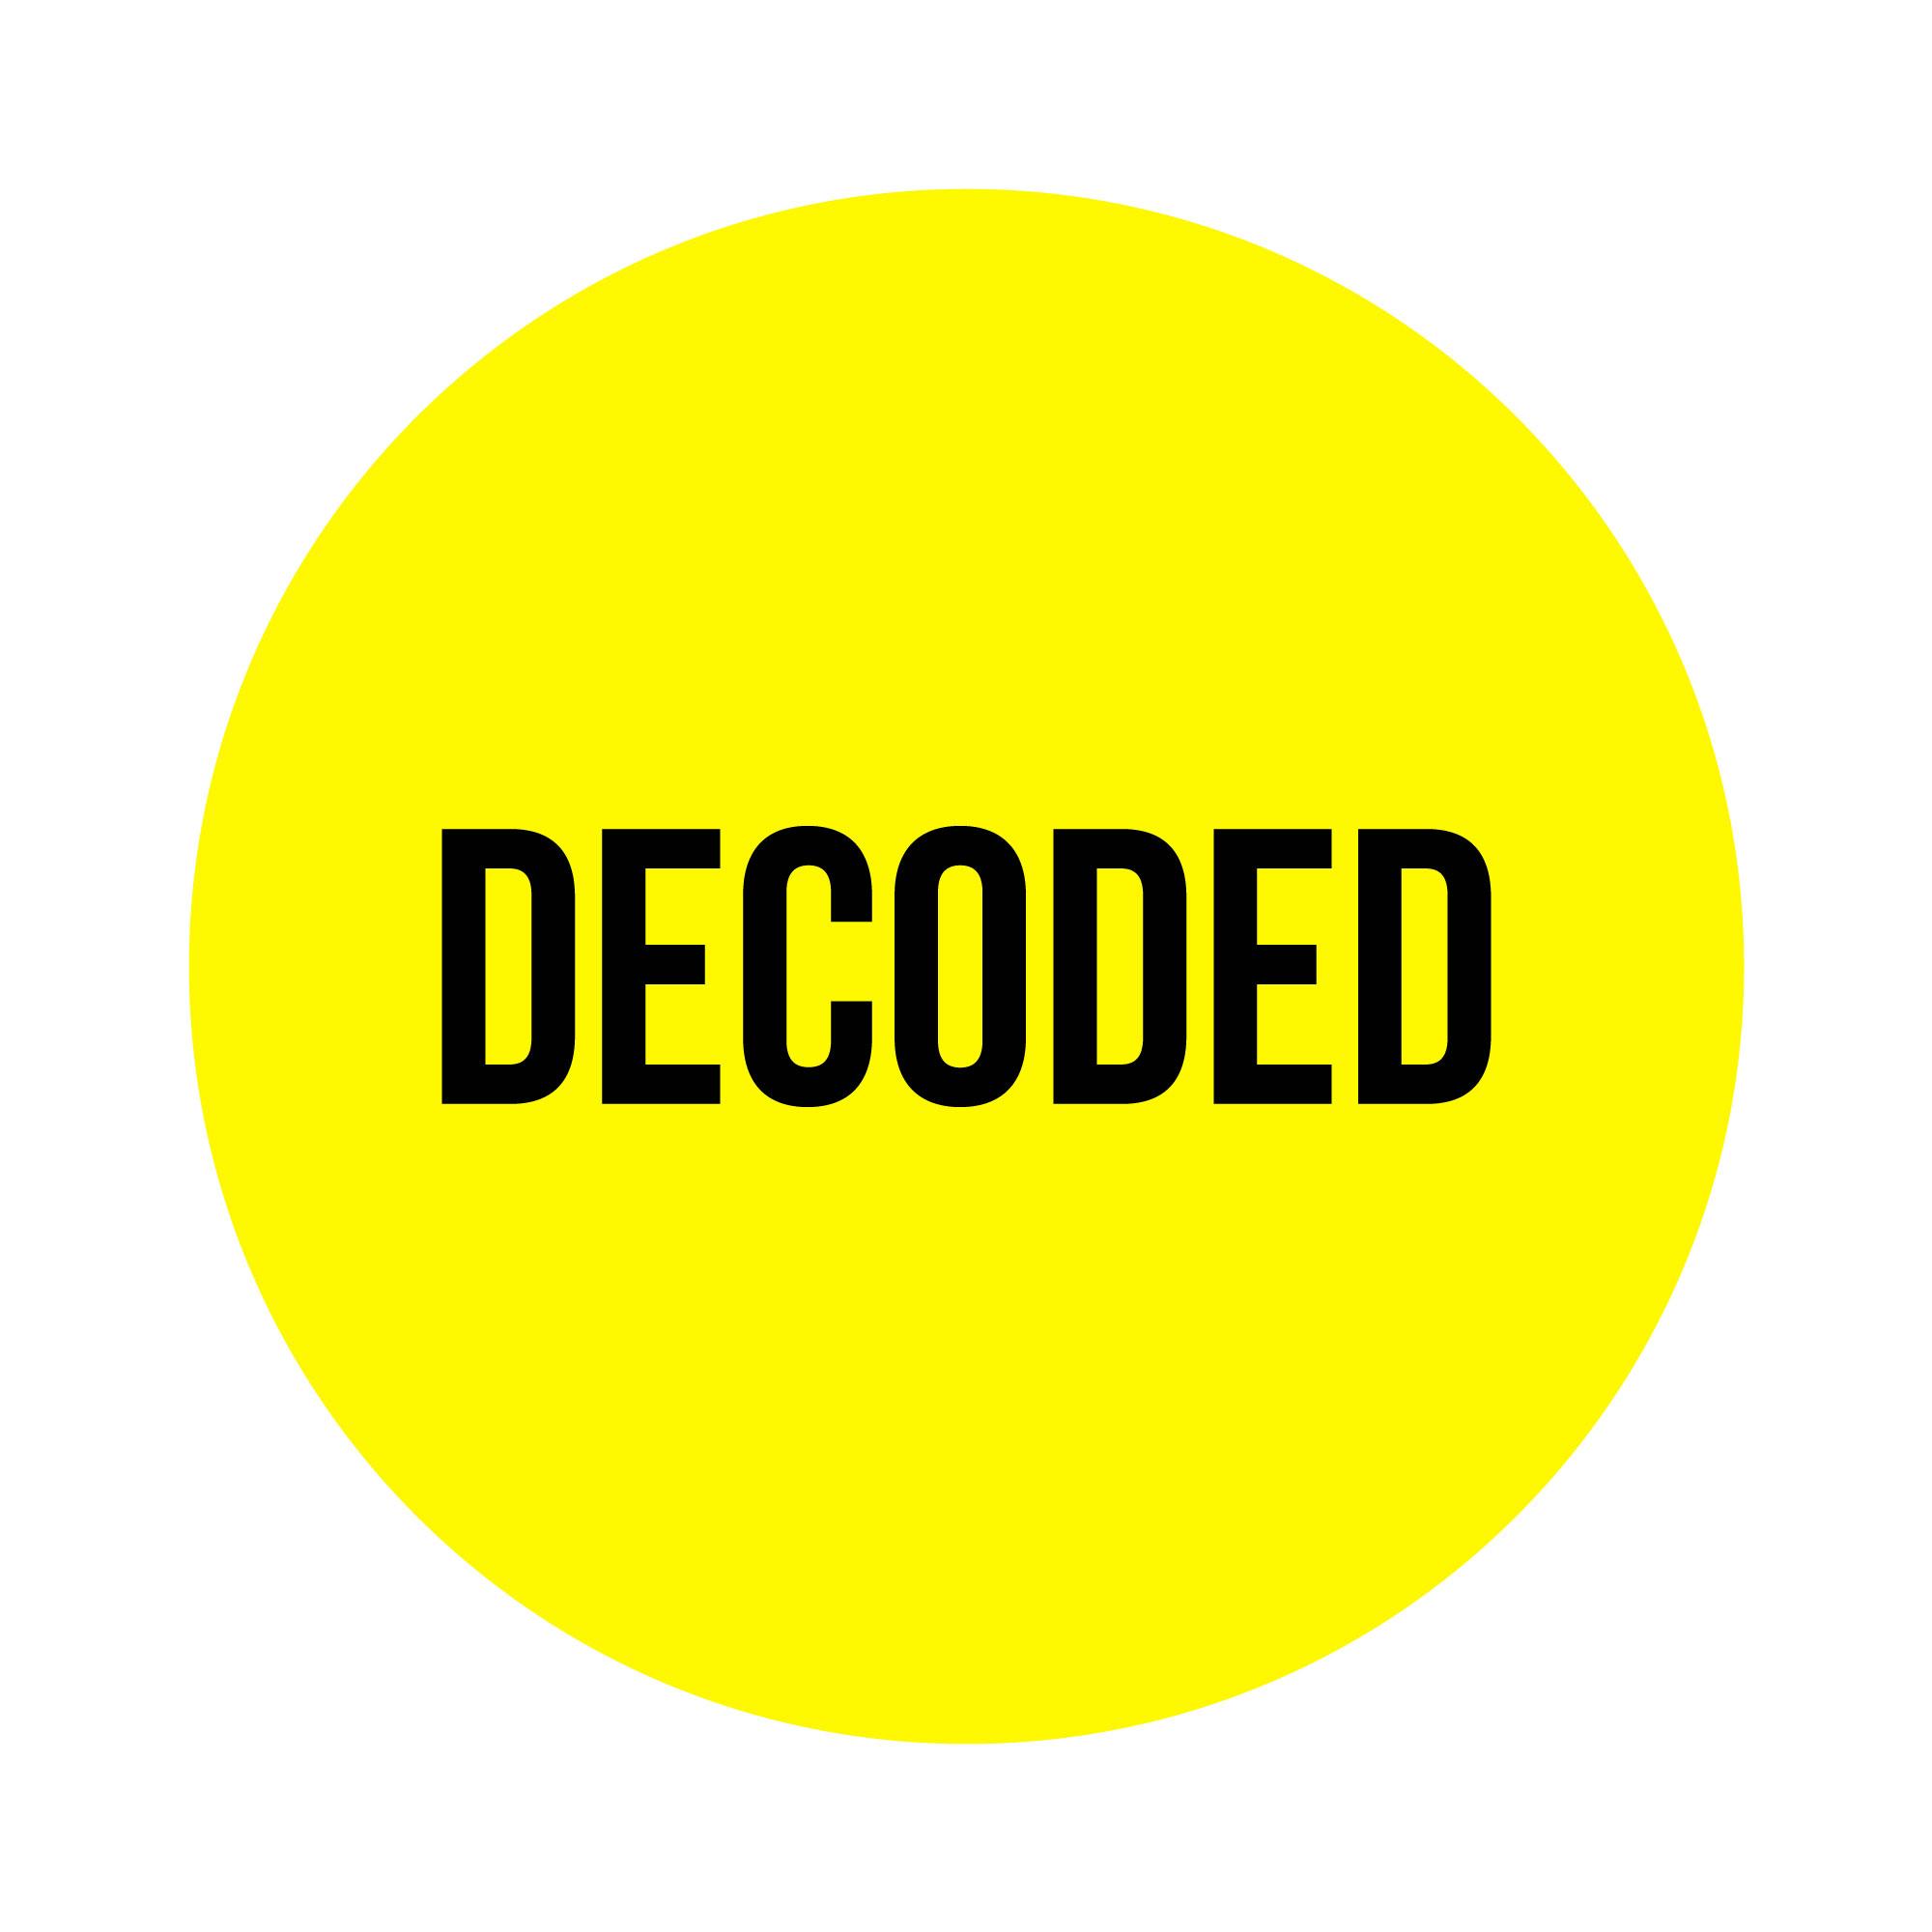 Decoded_round_RGB